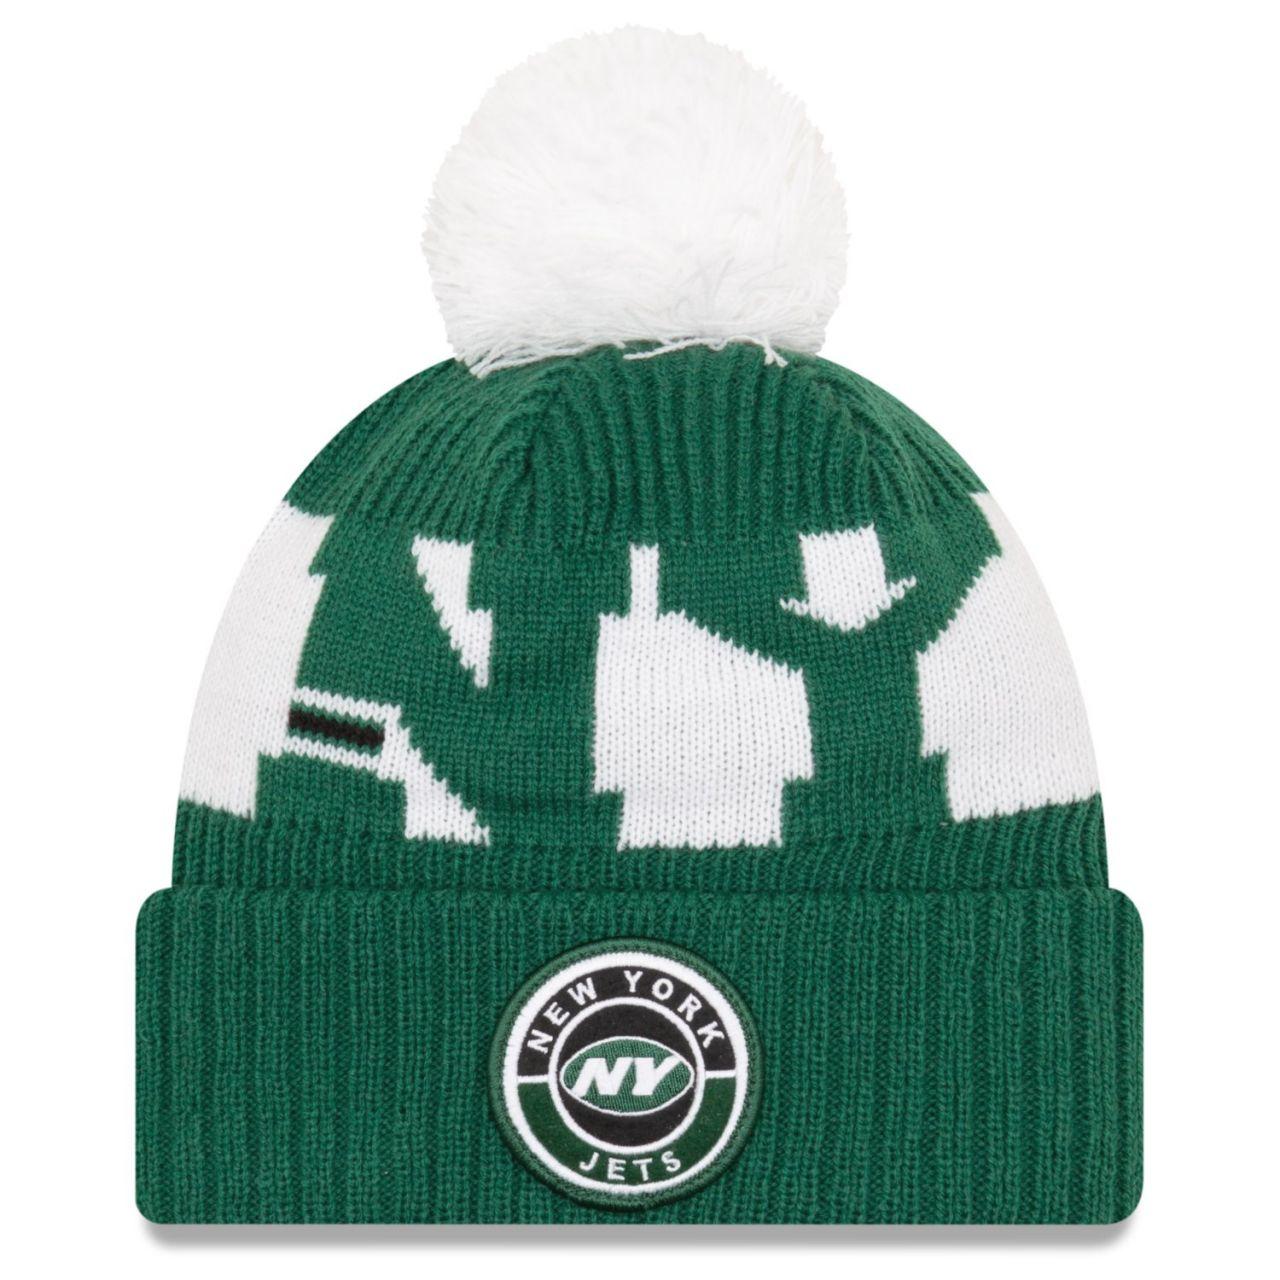 amfoo - New Era NFL ON-FIELD Sideline Mütze - New York Jets